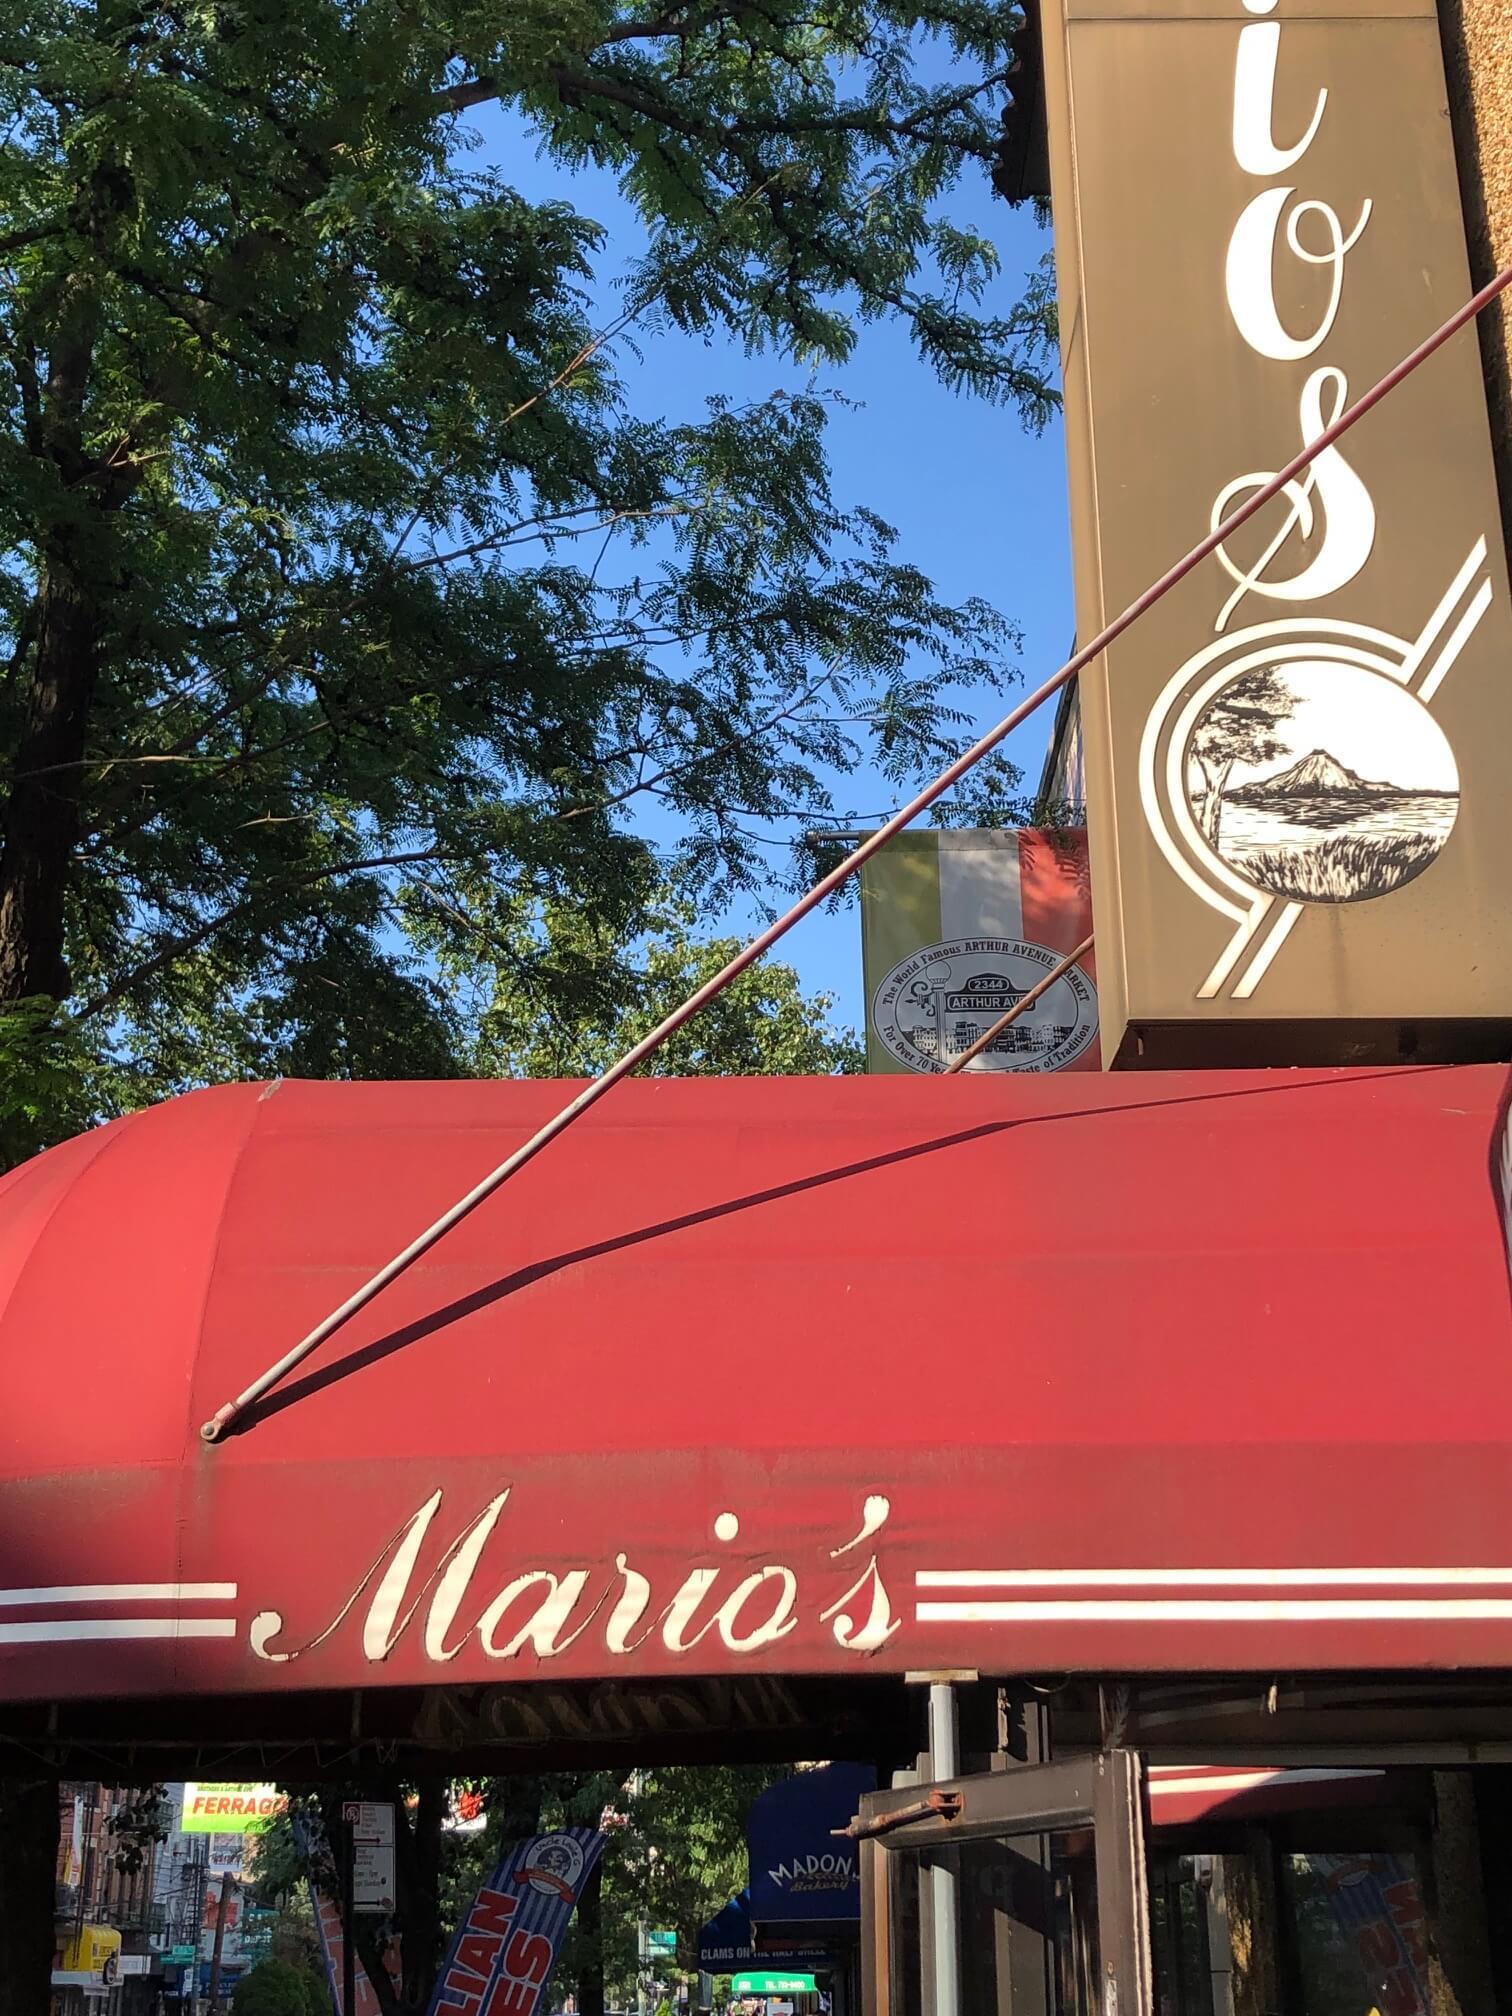 Mario's restaurant in the Bronx